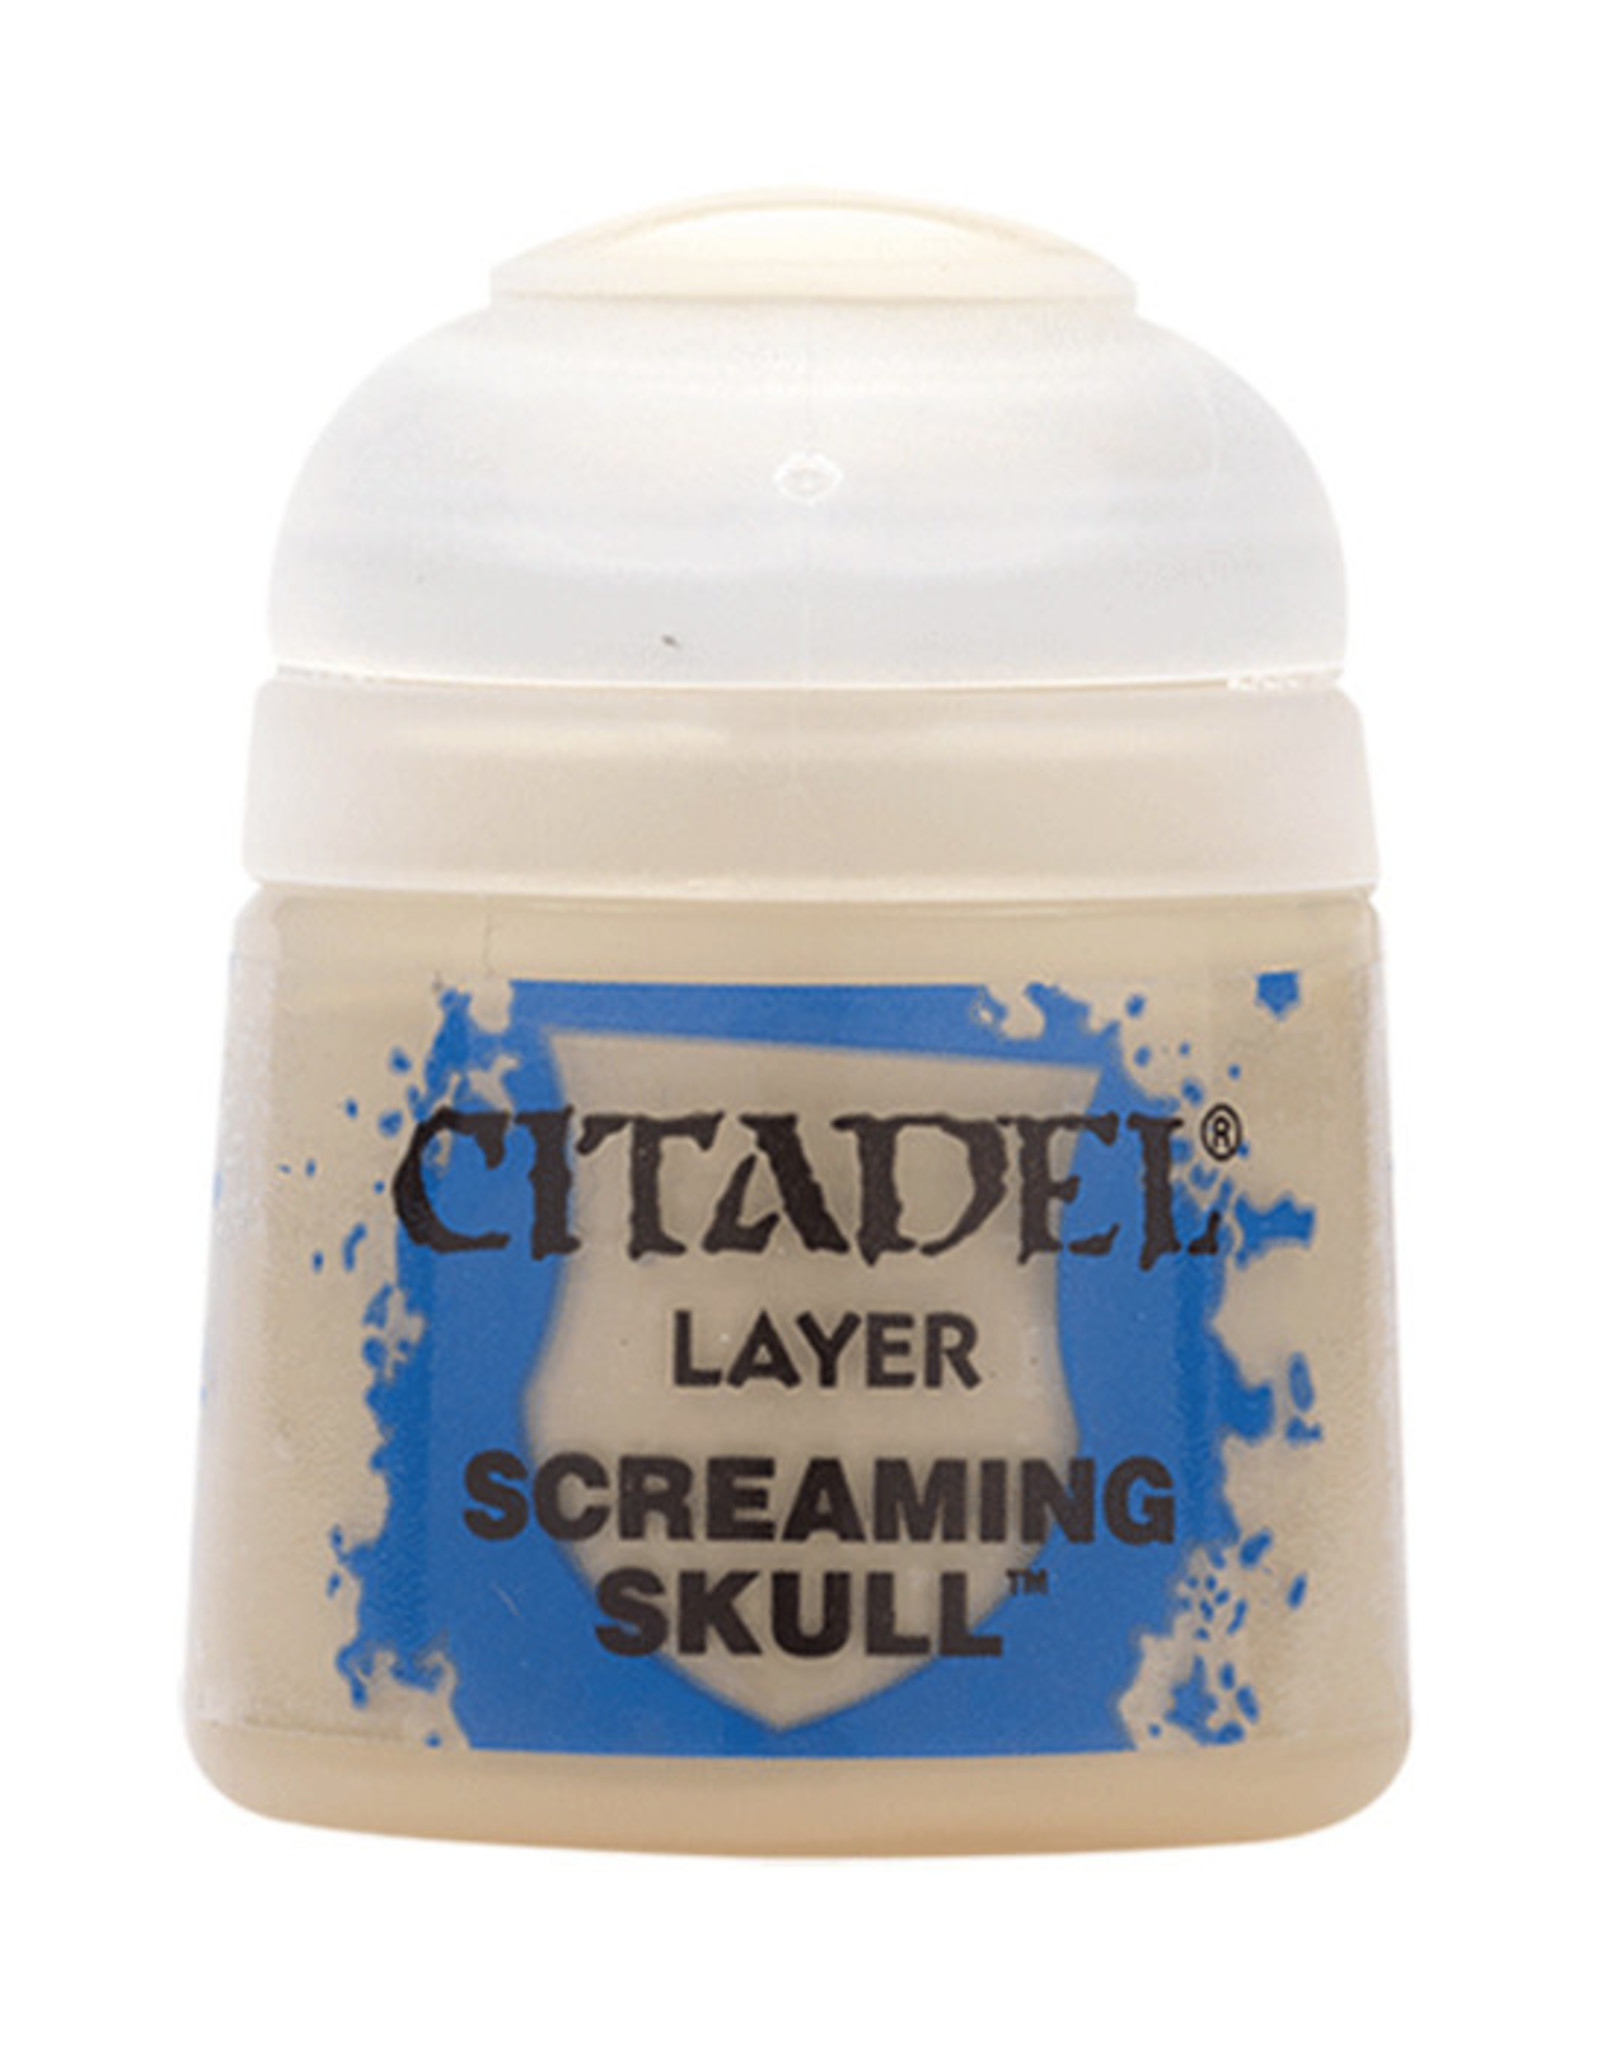 Citadel Citadel Colour: Layer - Screaming Skull